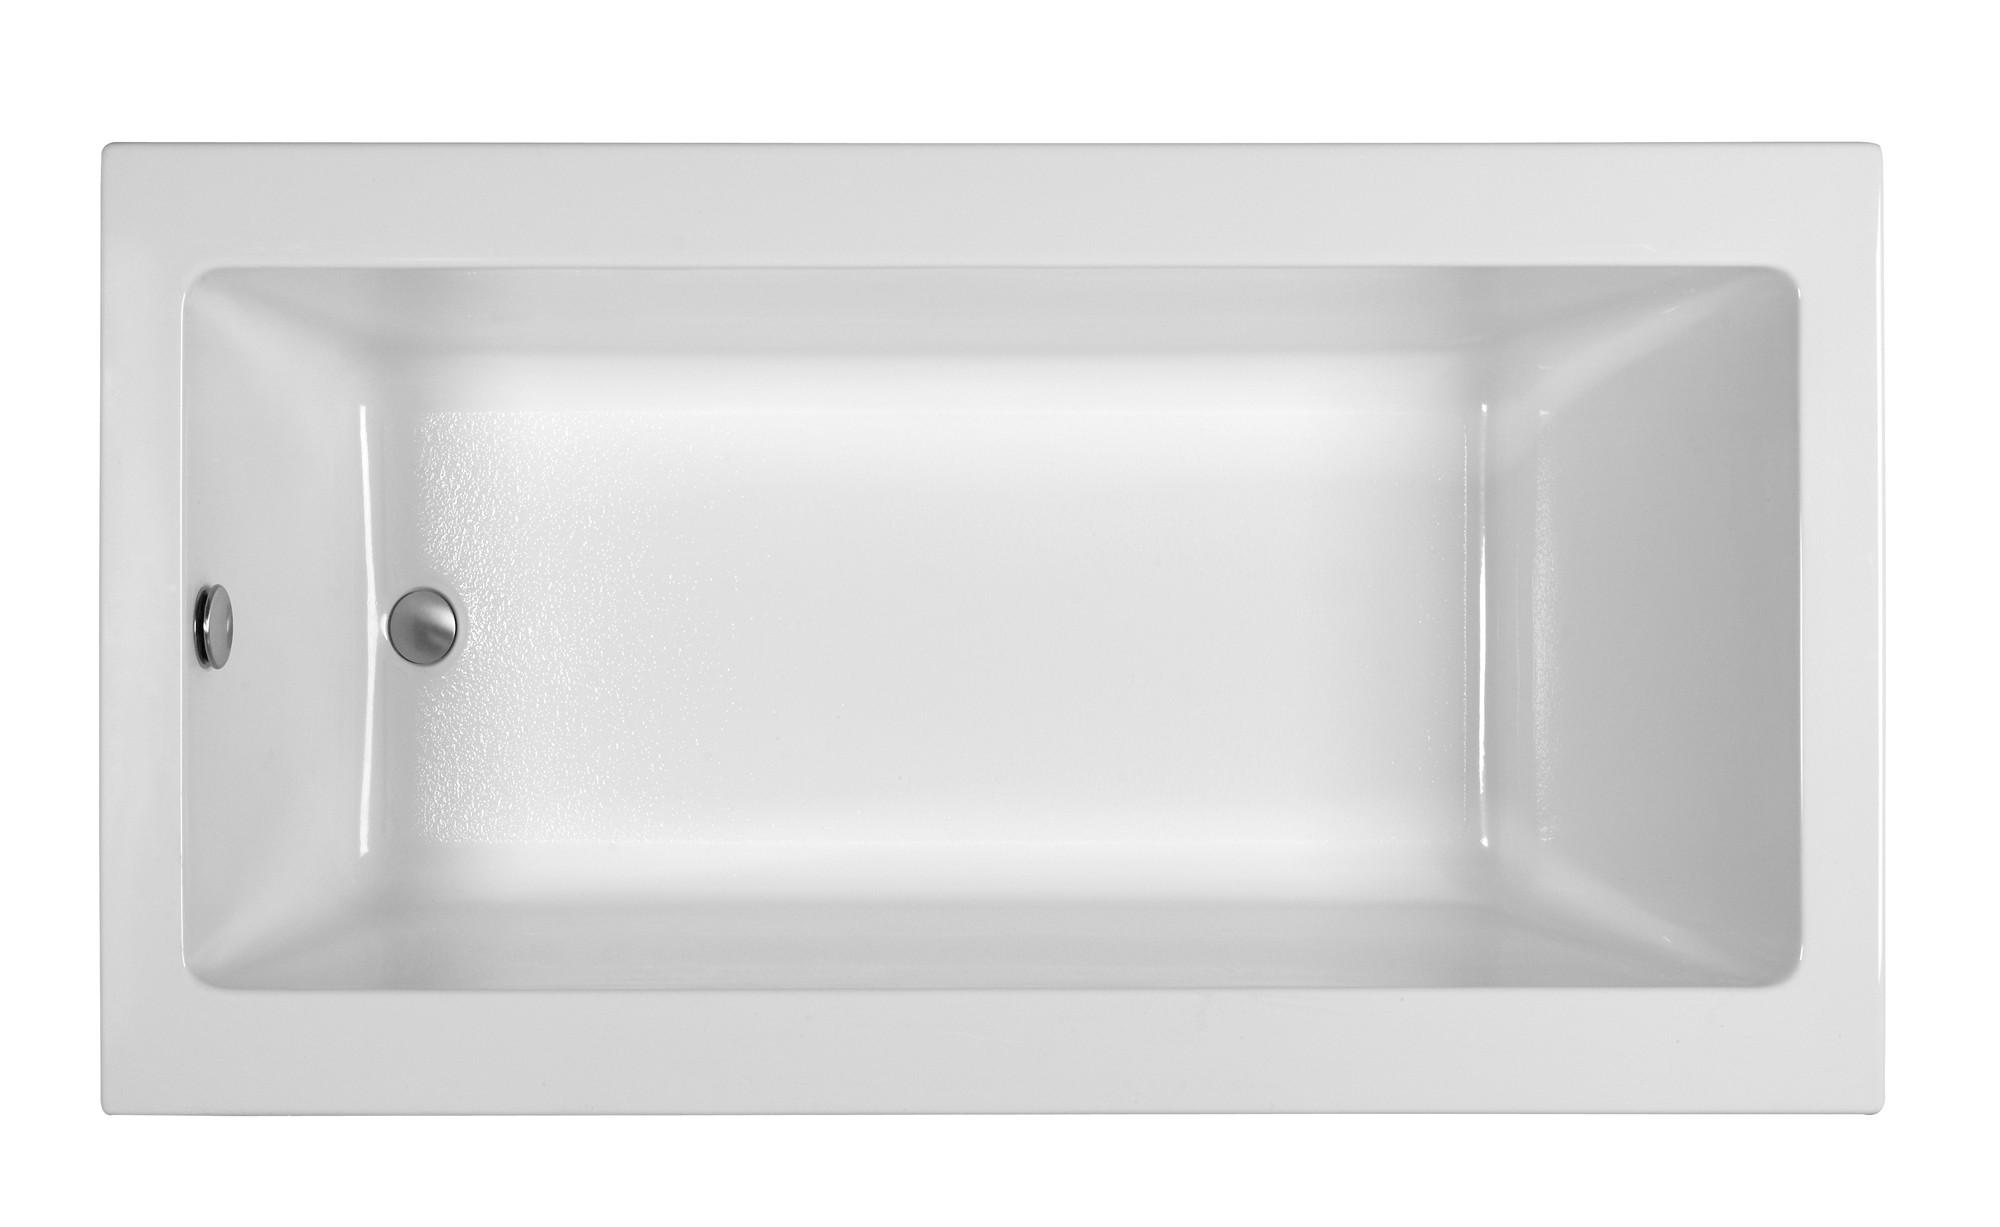 Reliance R6632CRFSVS End Drain Freestanding Soaking Tub (Bathtubs)